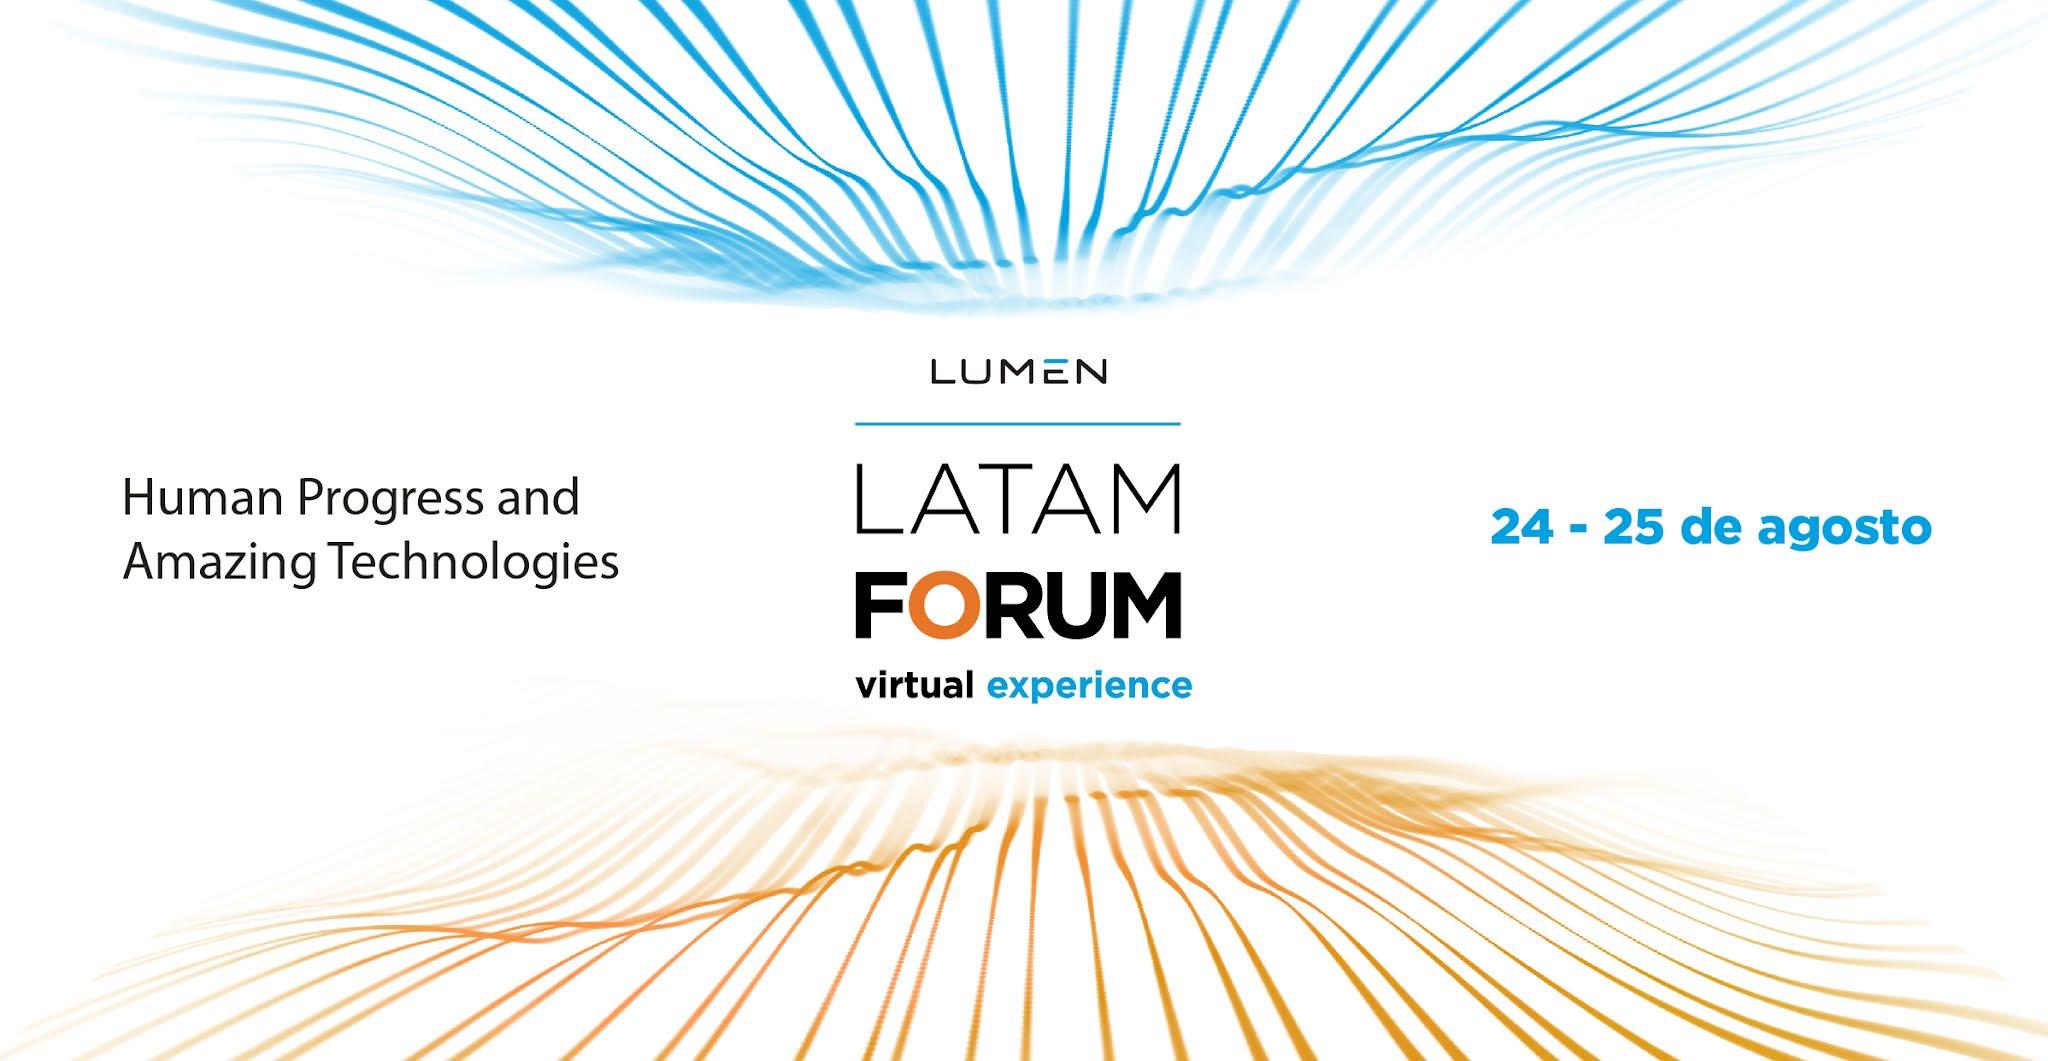 #LumenLatamForum